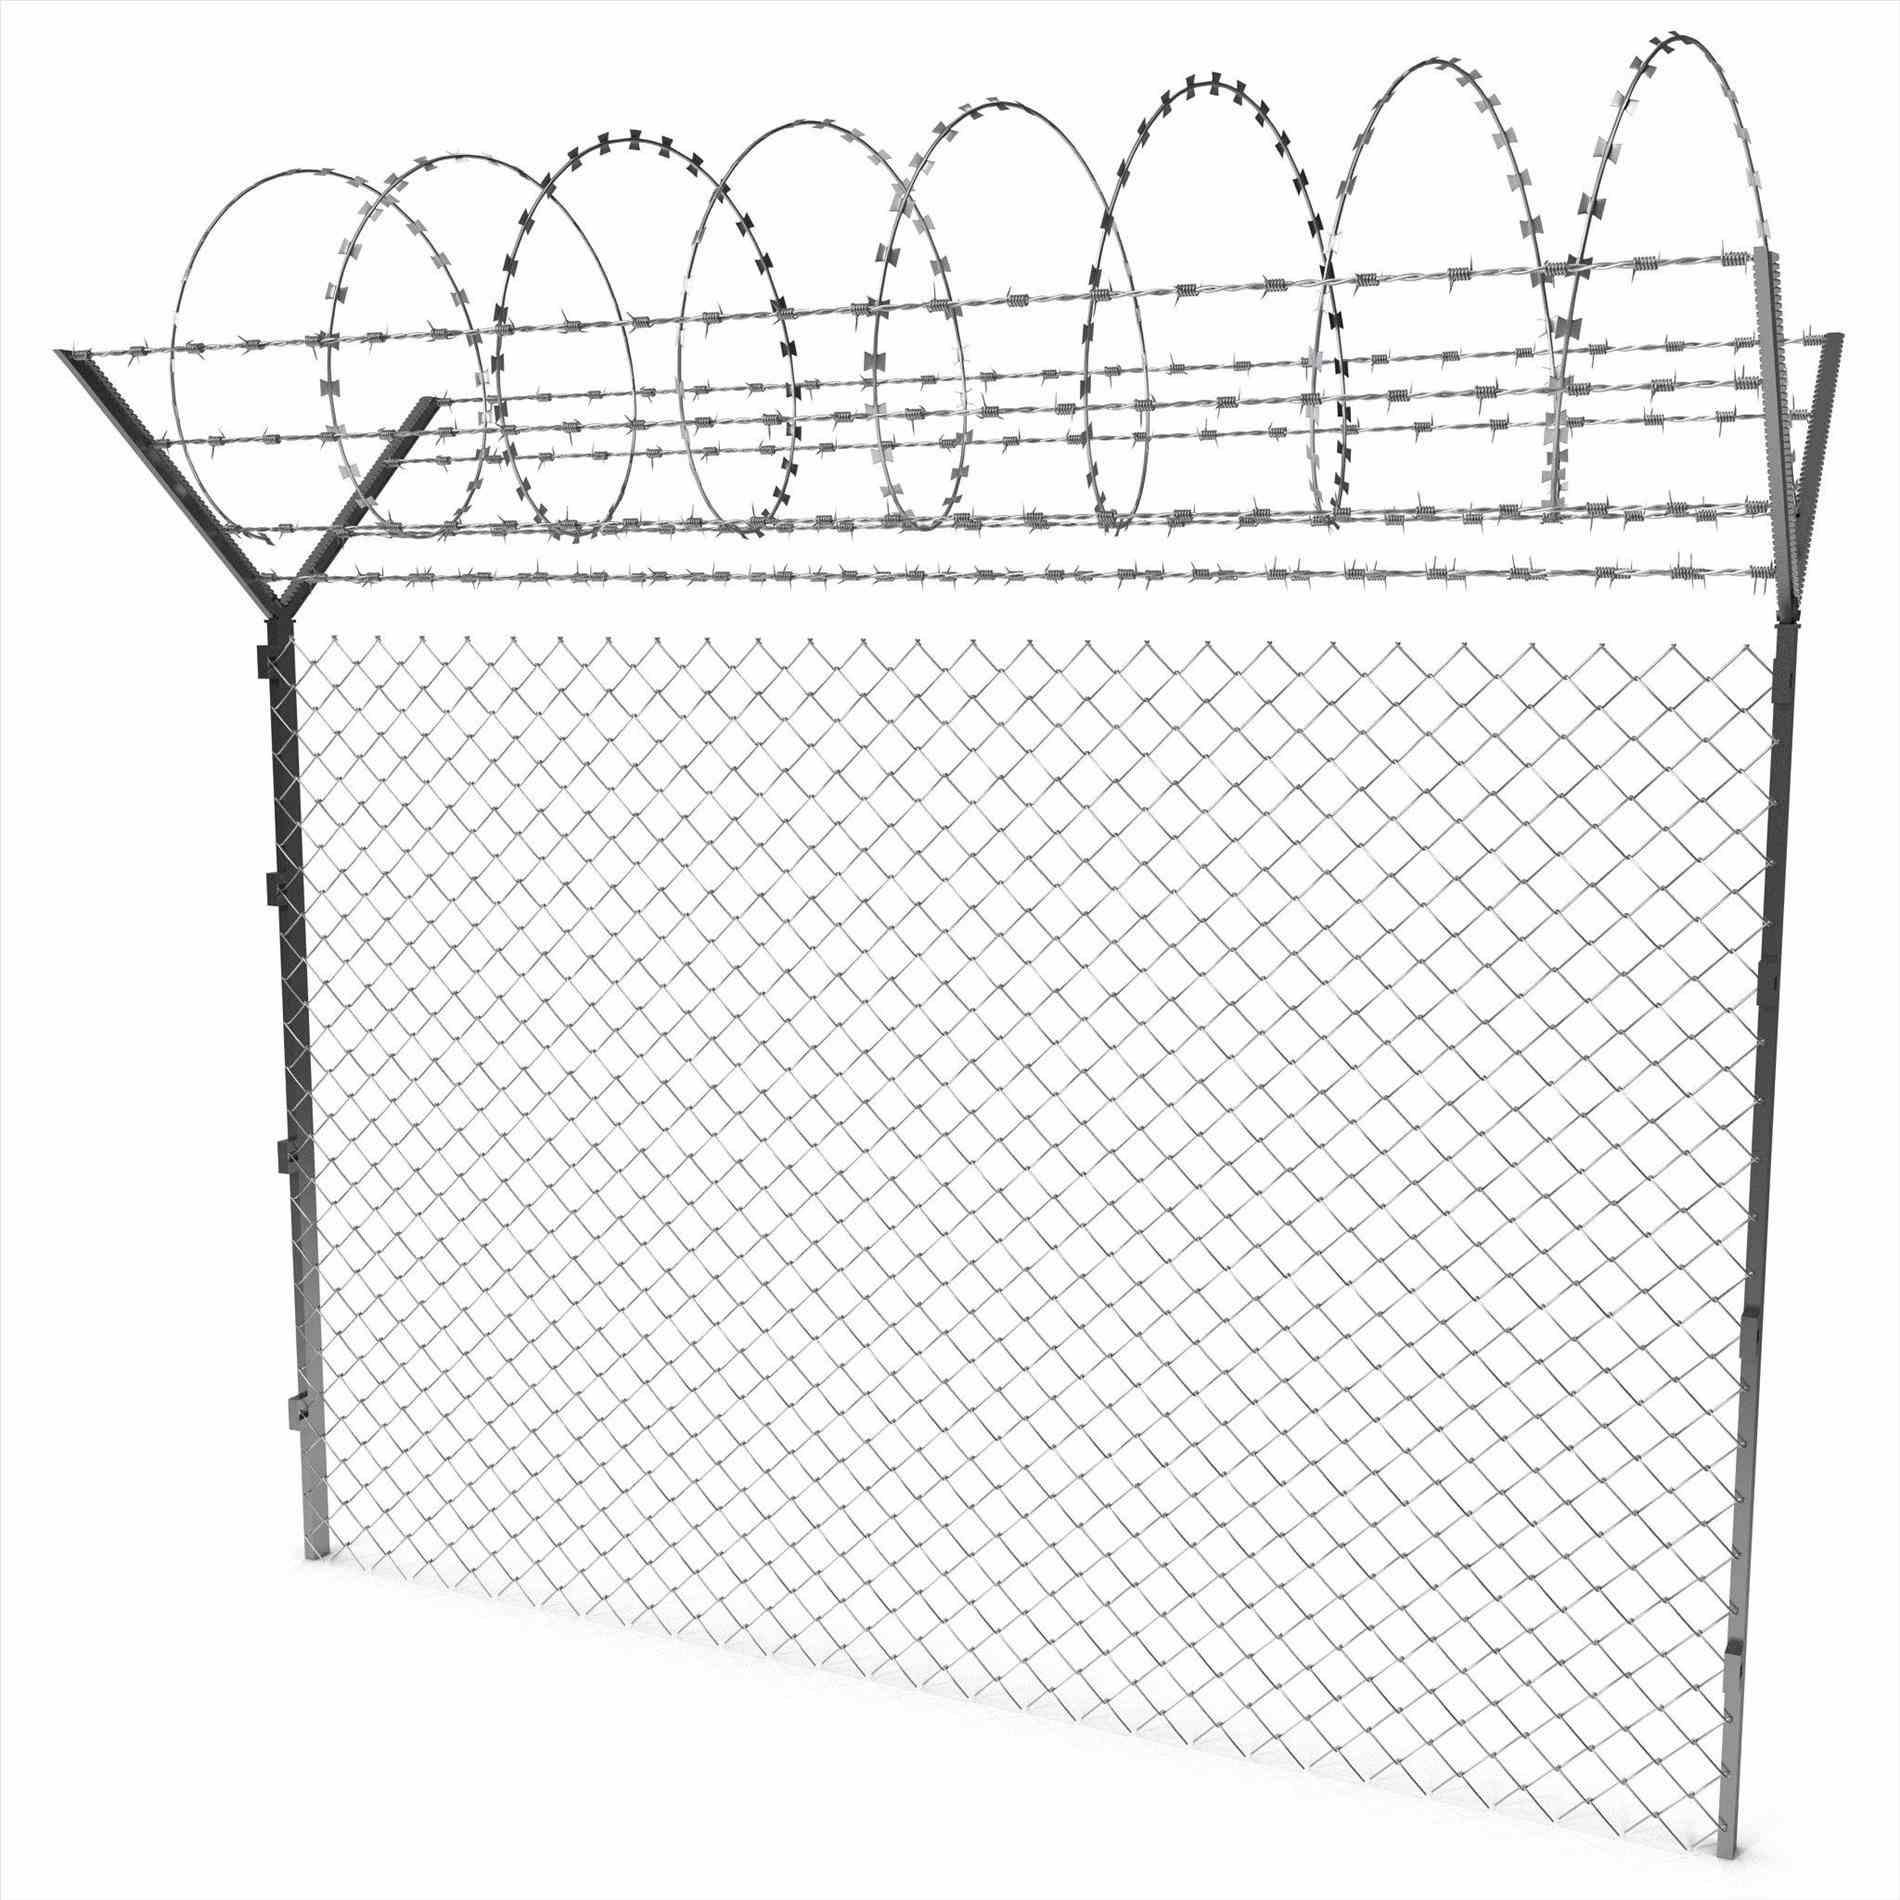 1900x1900 Wood Fence Details Rail Fence Black Locust Cedar U Rainscreen